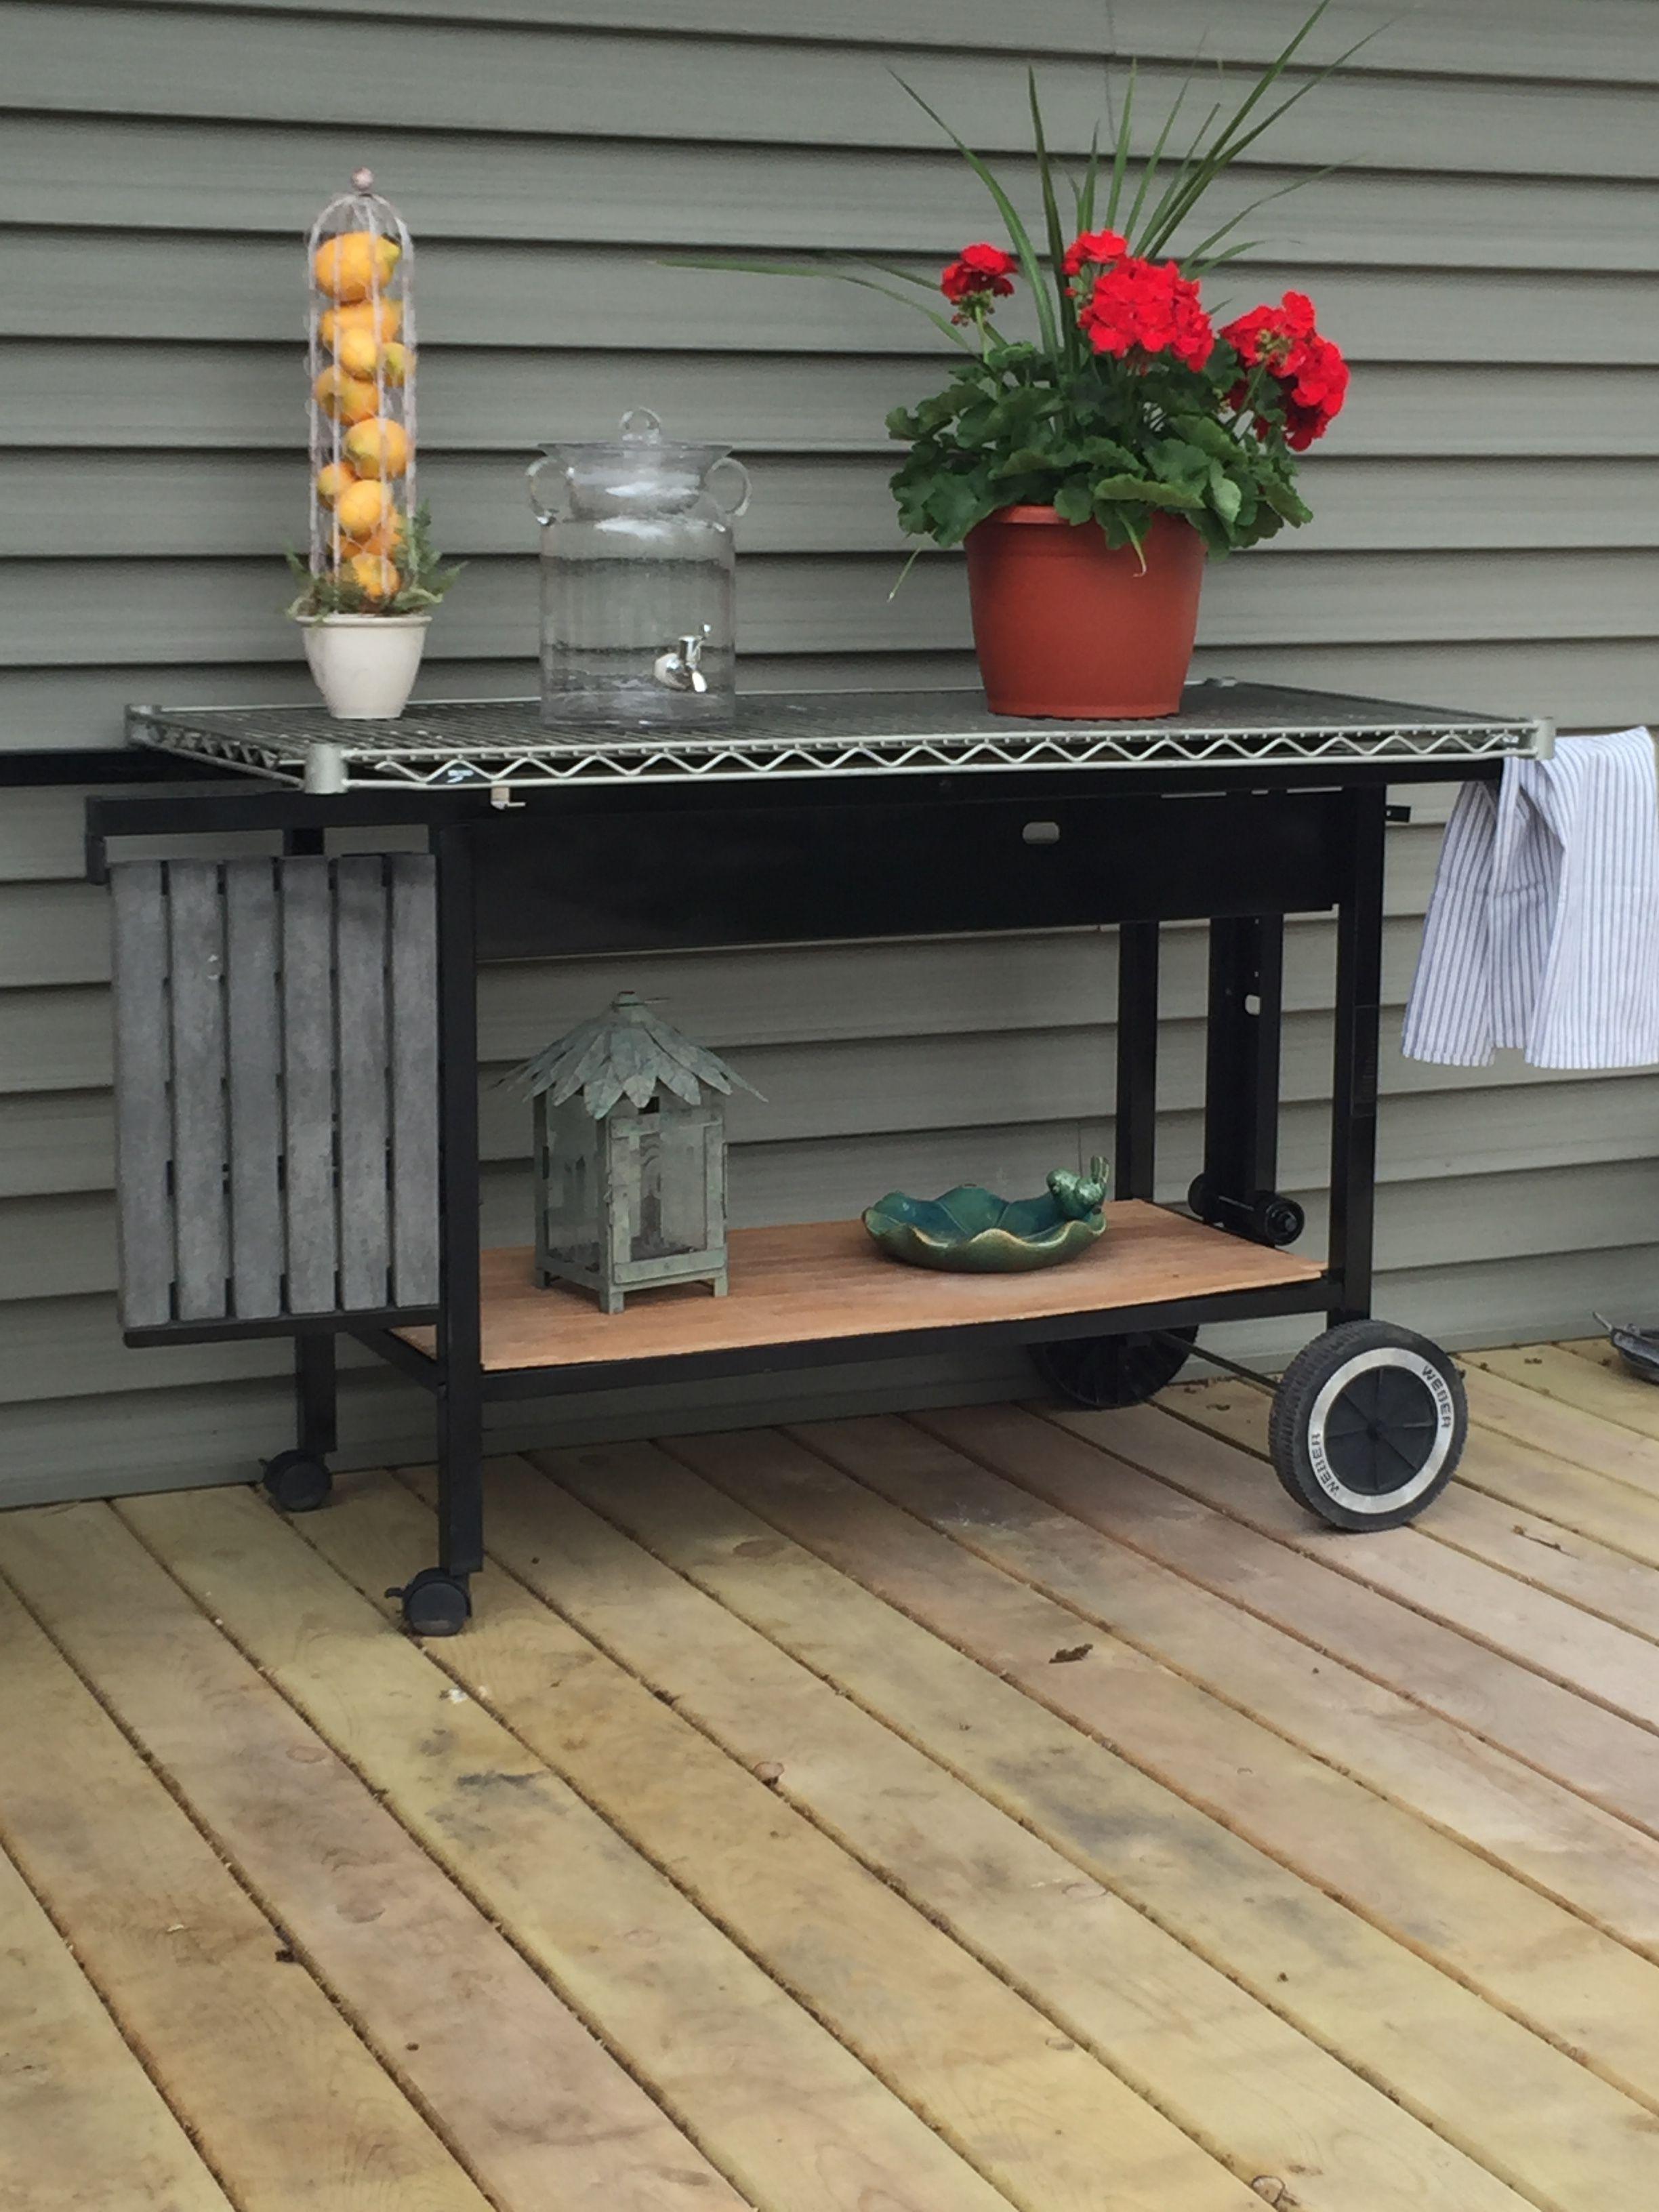 Transformed My Old Gas Grill Into This Great Multipurpose Deck Cart Diy Patio Repurposed Items Repurposed